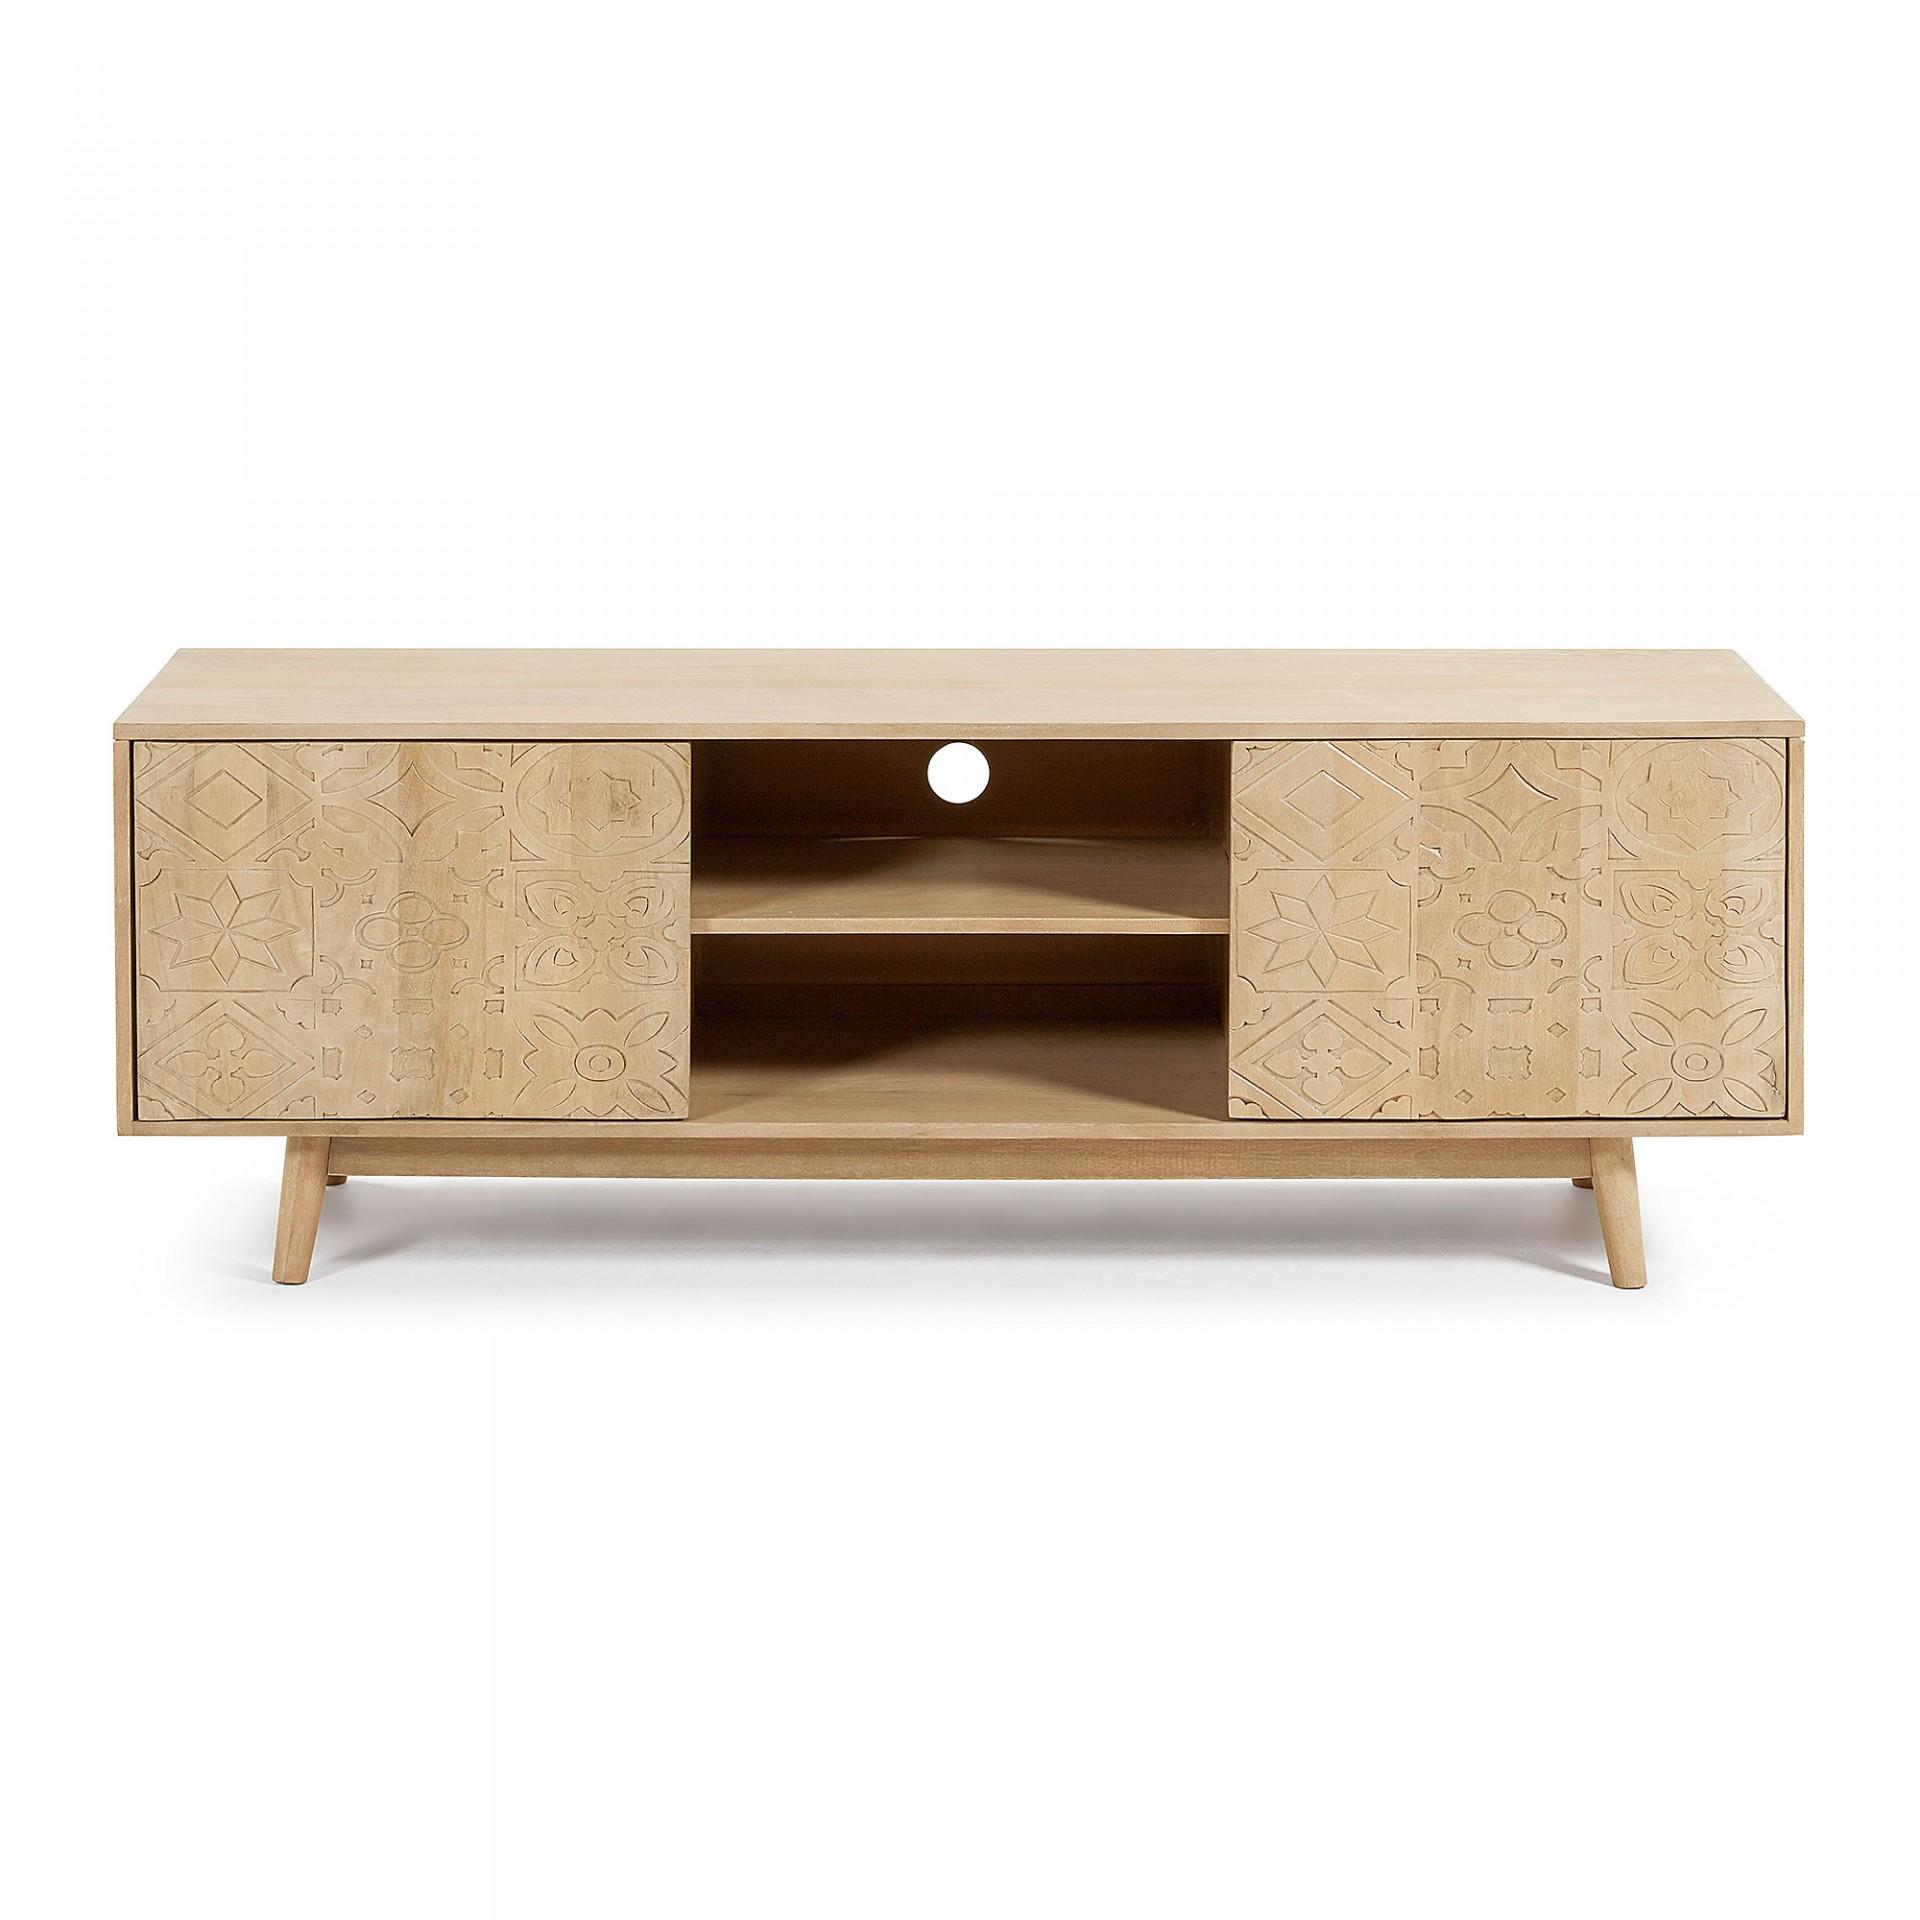 Móvel TV Selab, madeira de manga natural, 160x56